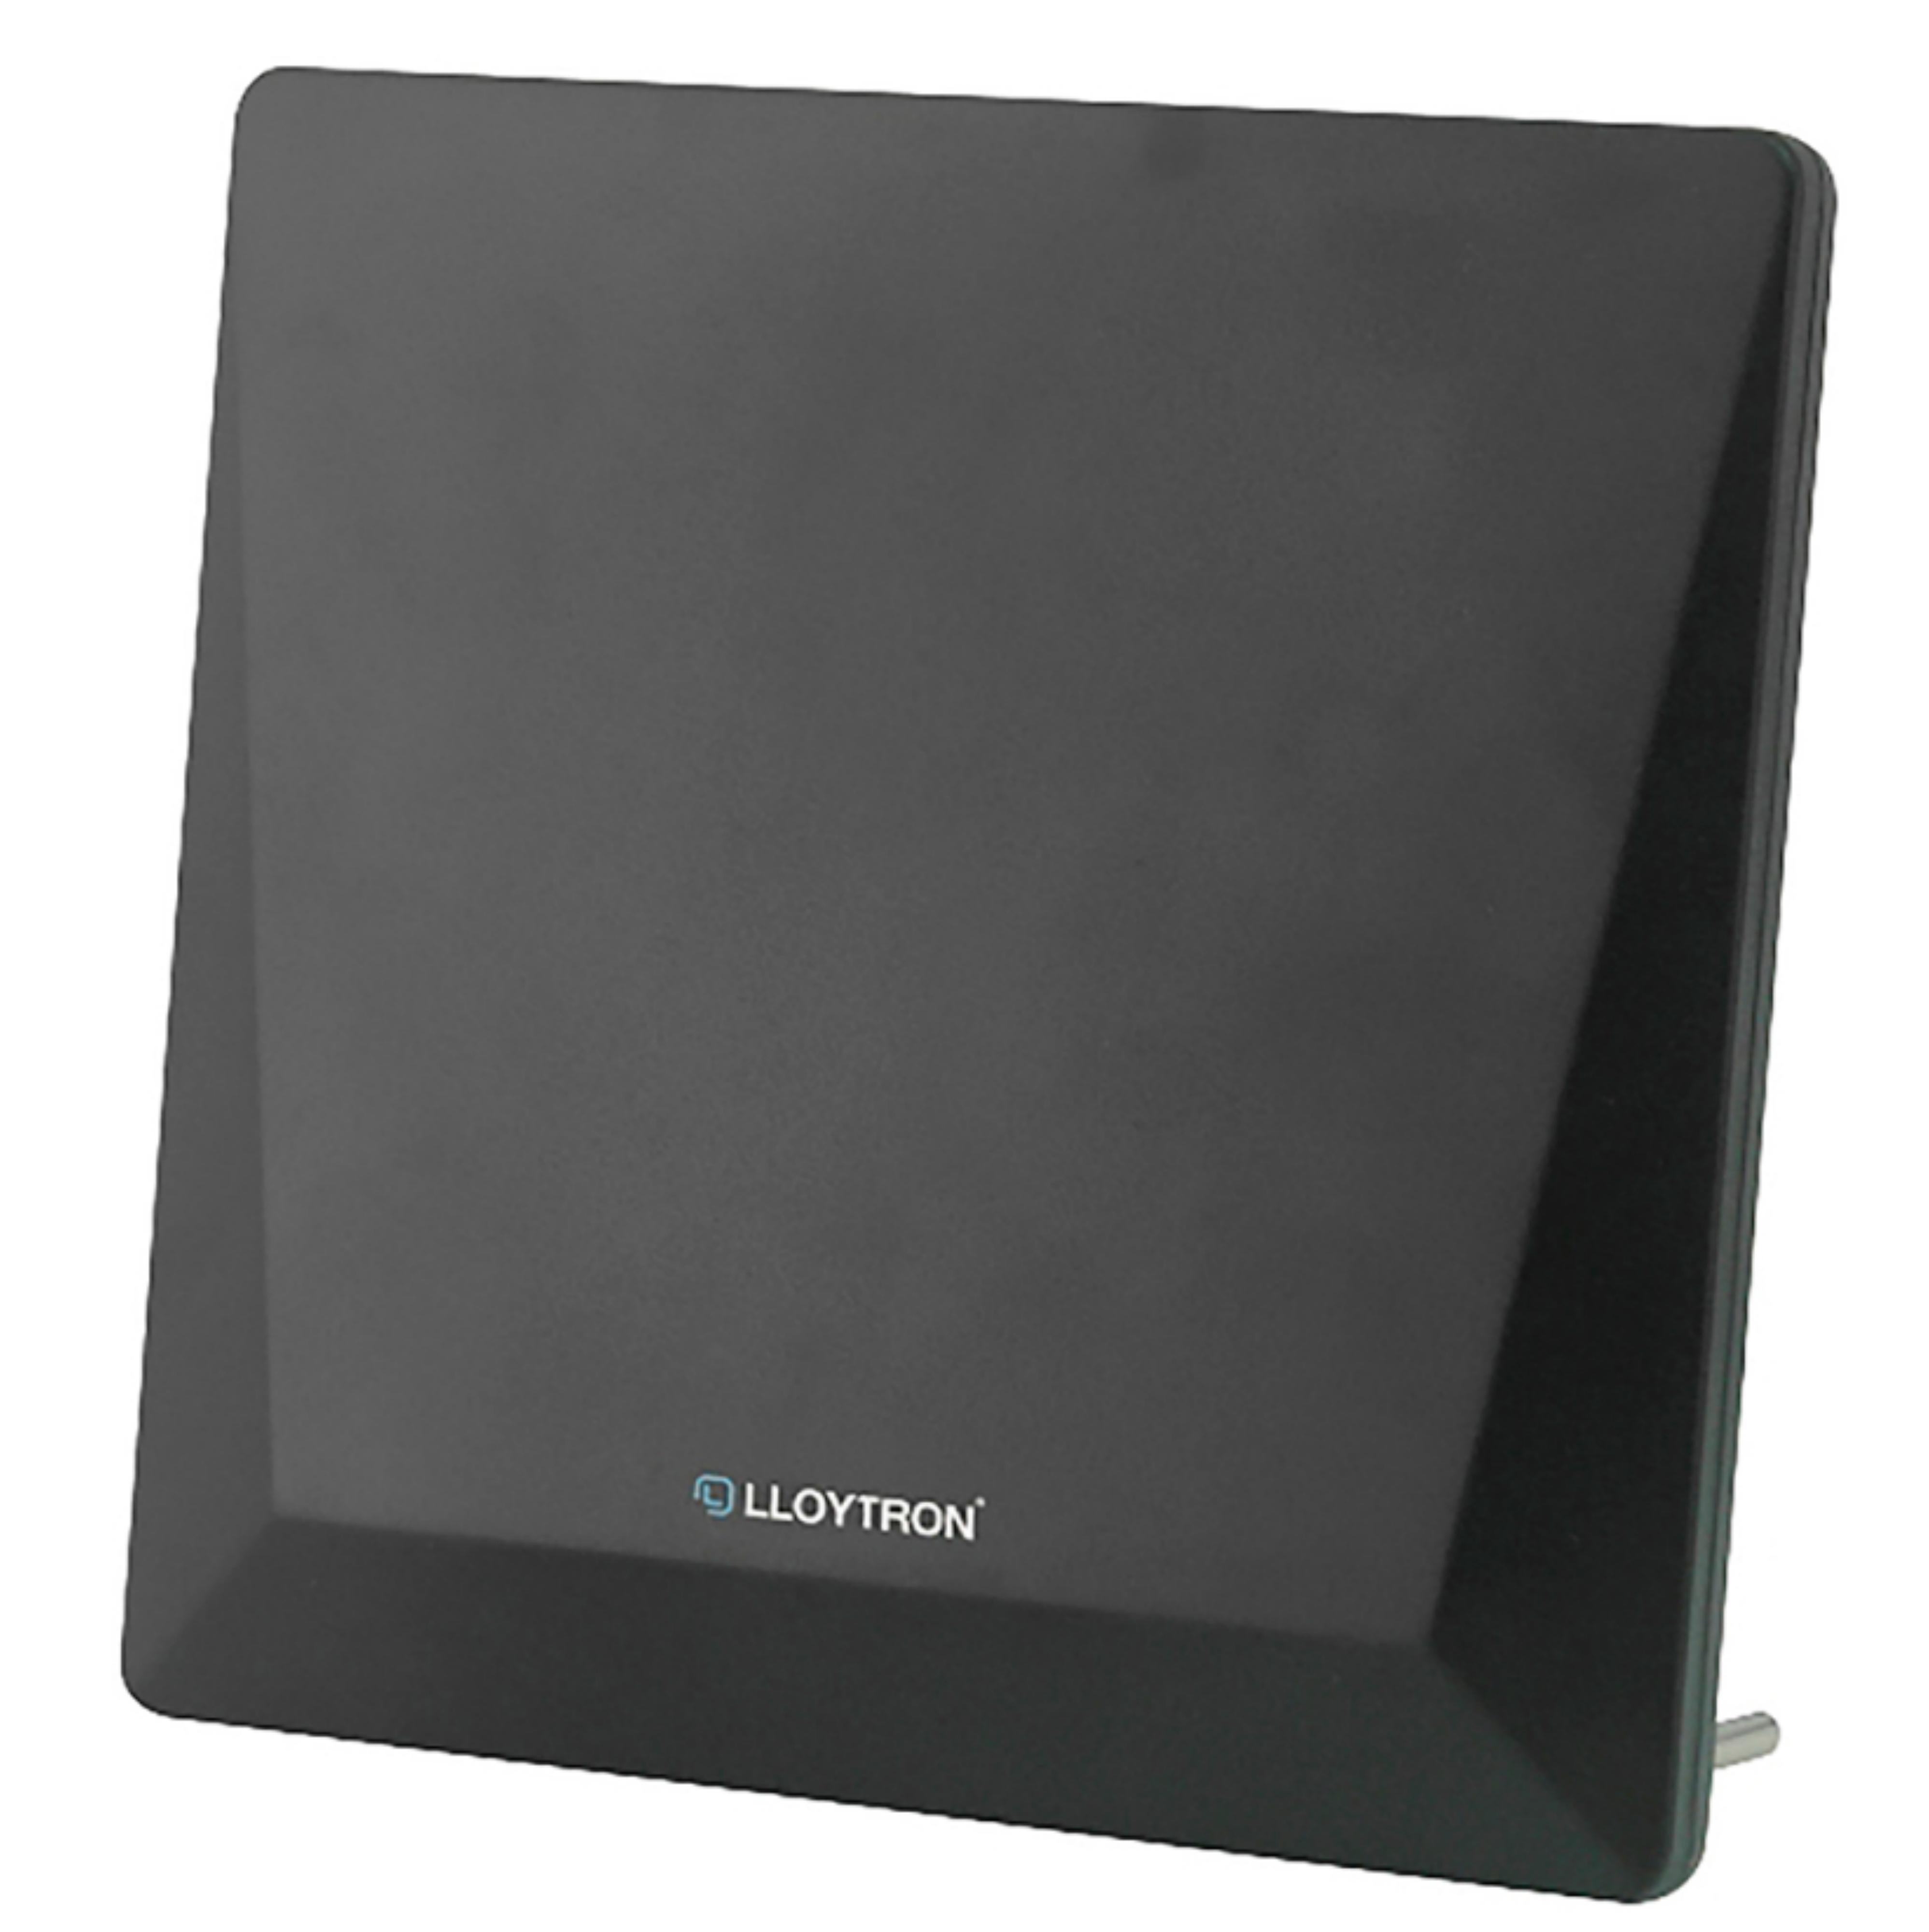 Lloytron A3103BK Active Indoor Digital Panel TV Antenna With 4G Filter - 50db